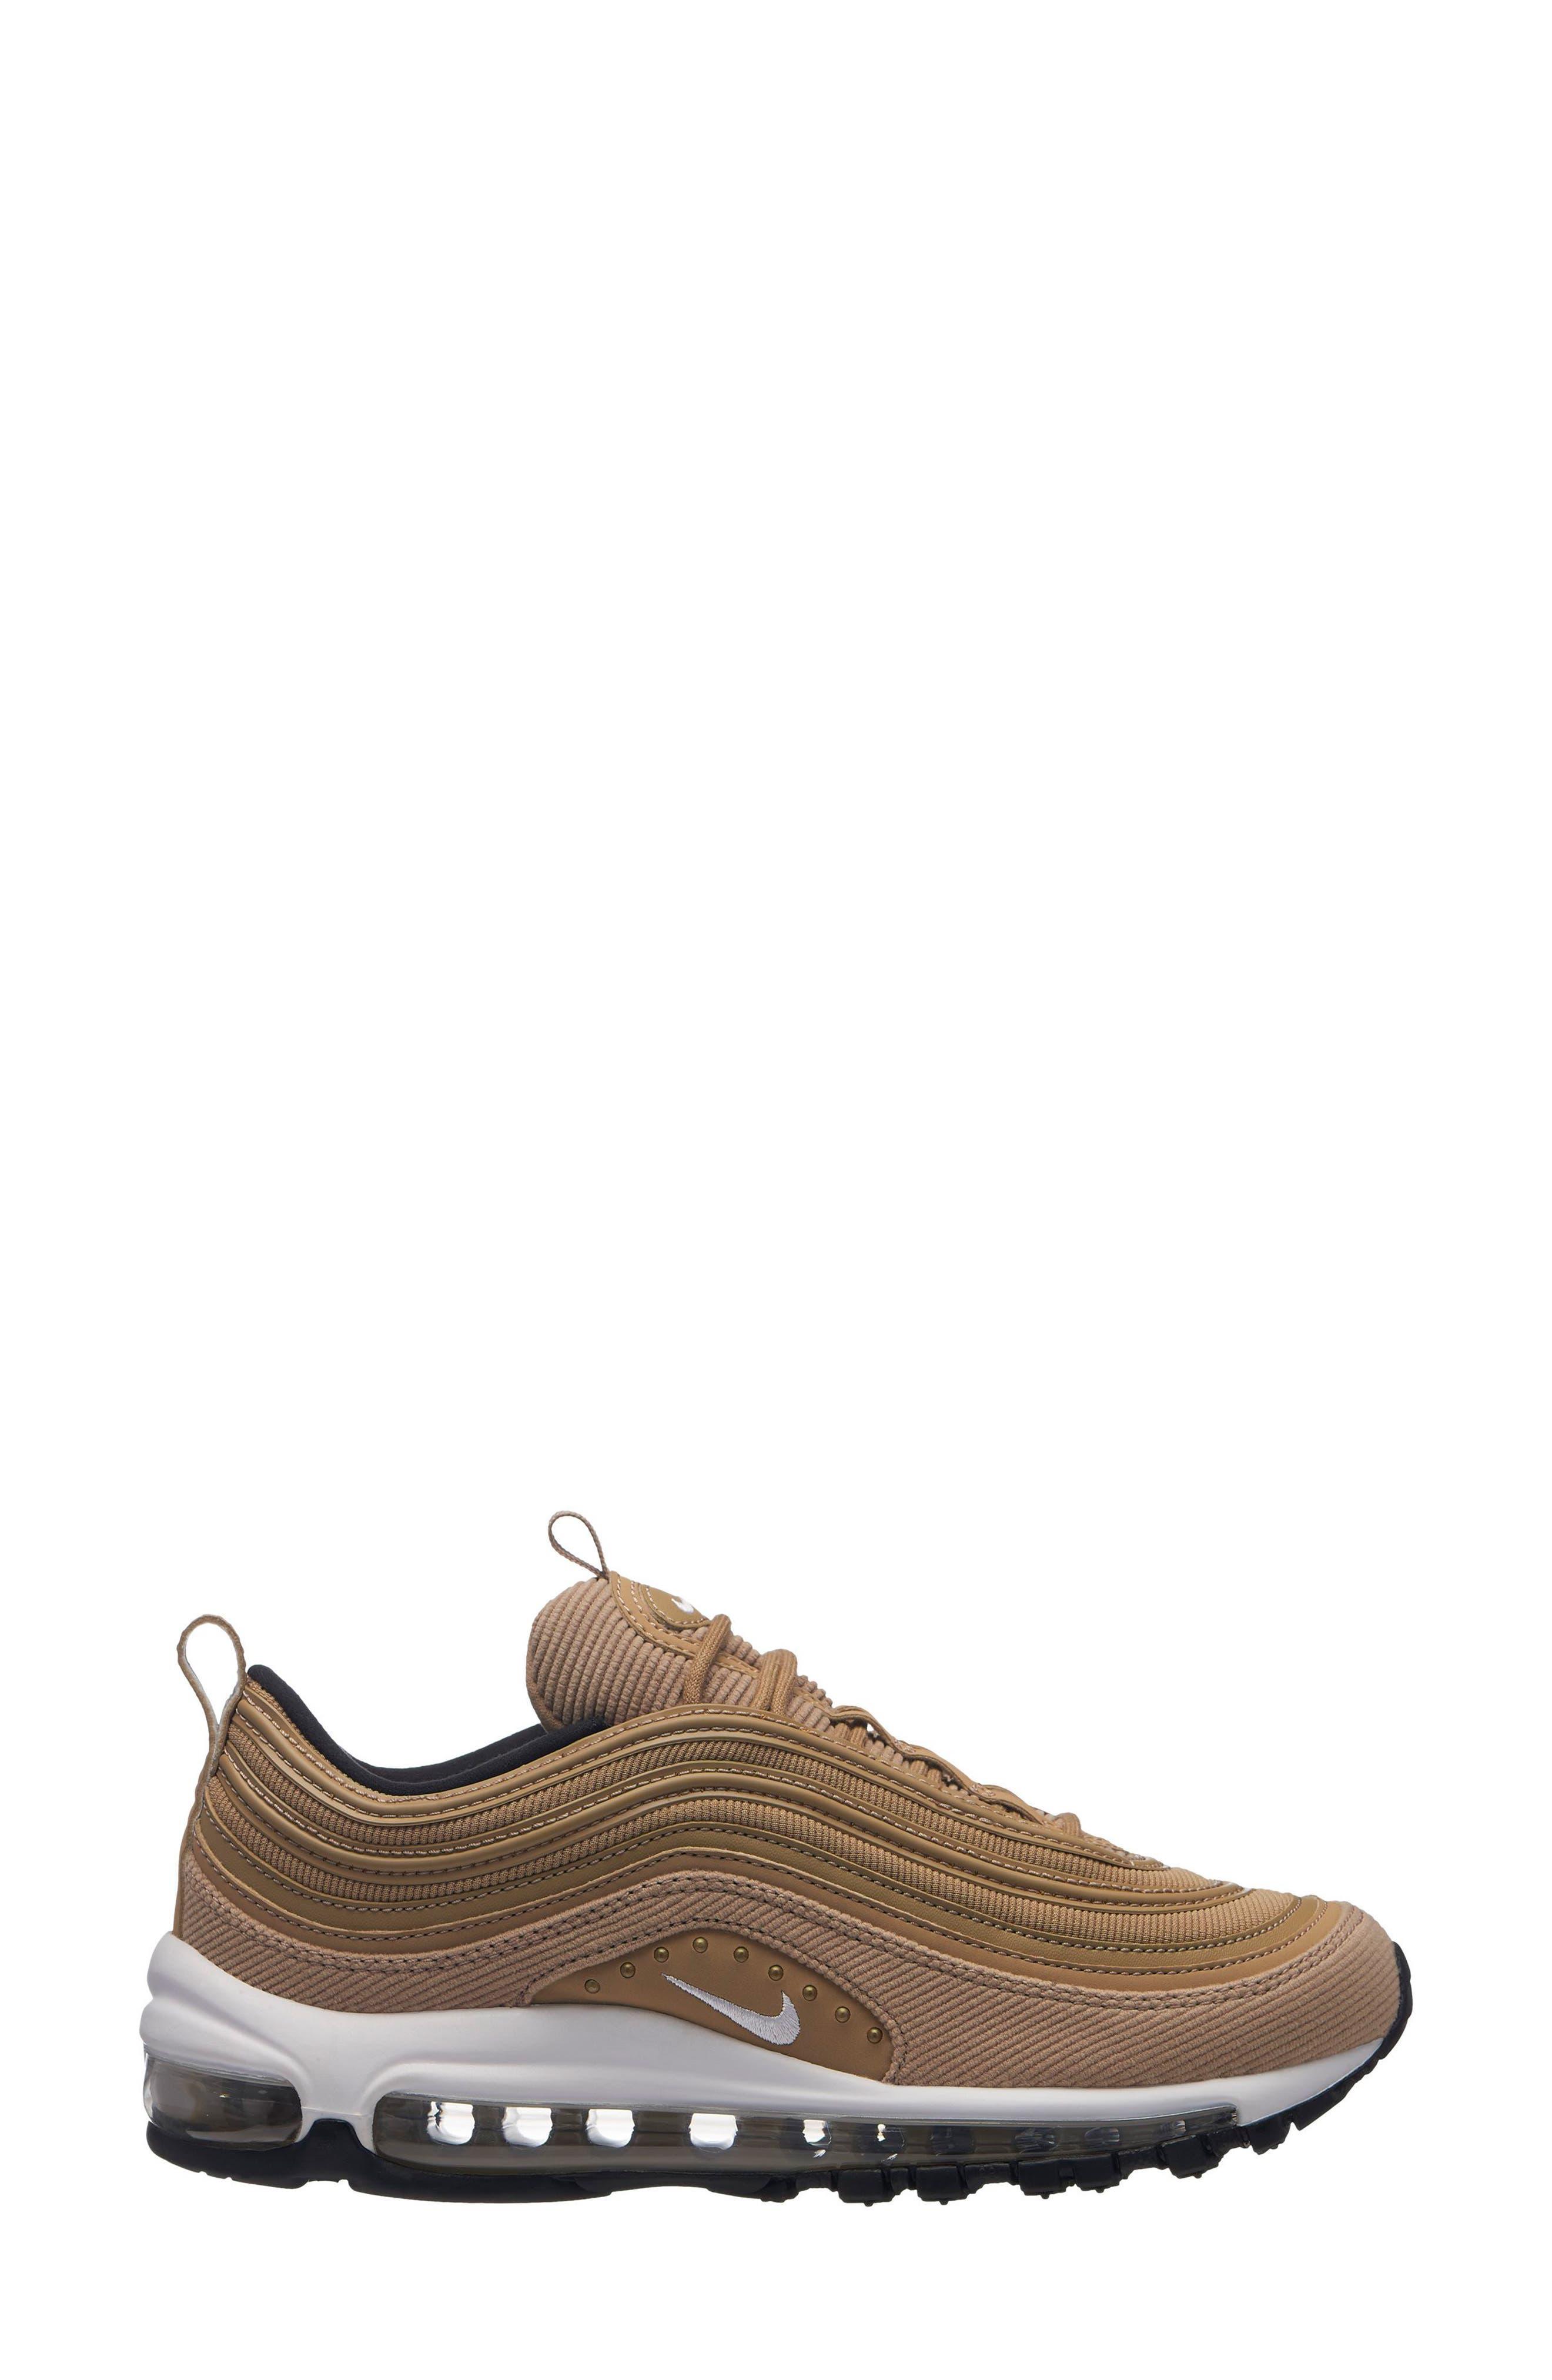 Air Max 97 SE Sneaker,                         Main,                         color, BEIGE/ WHITE-BLACK